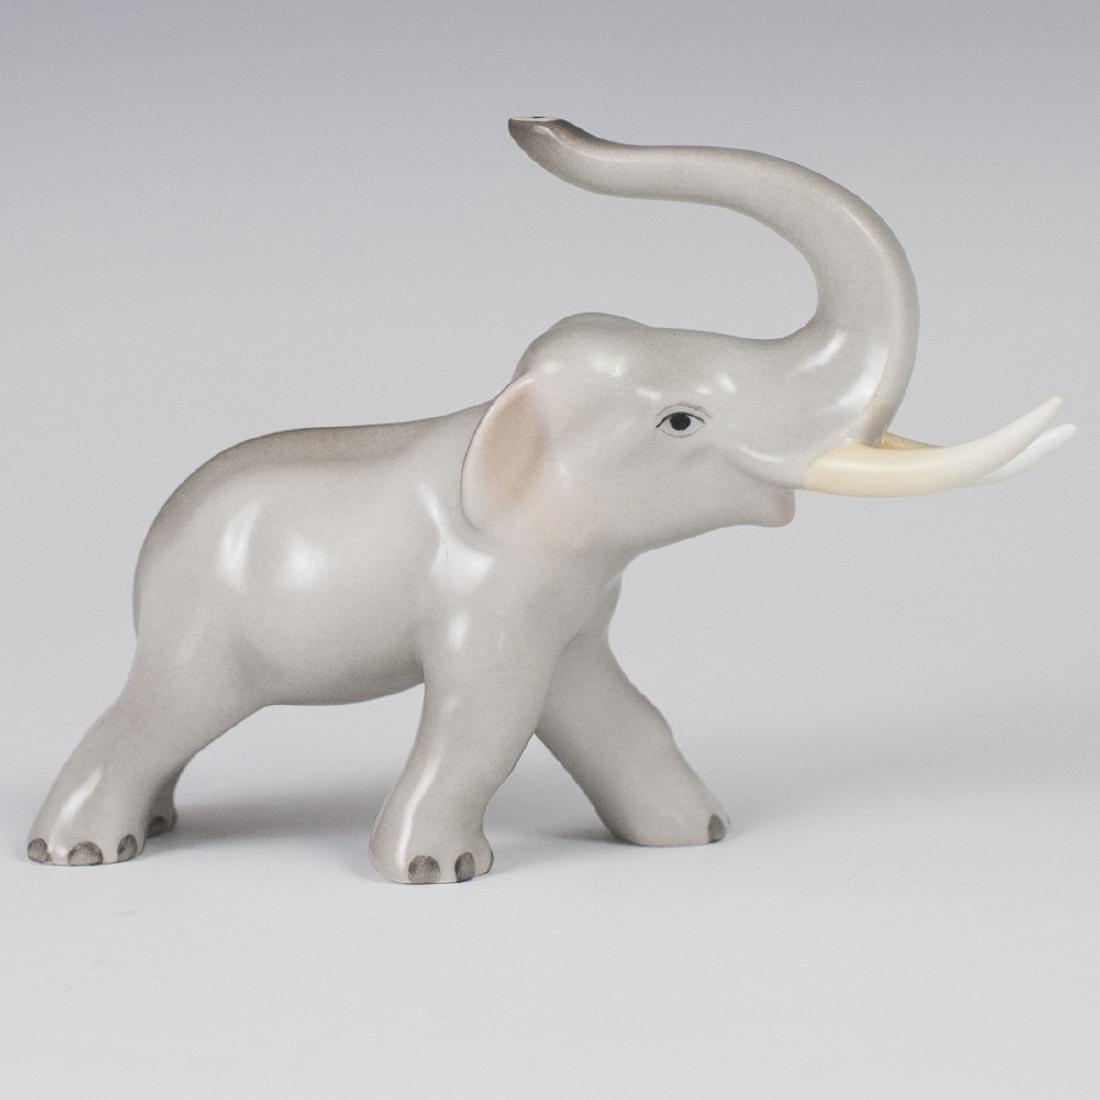 Herend Porcelain Naturalistic Elephant Figurine